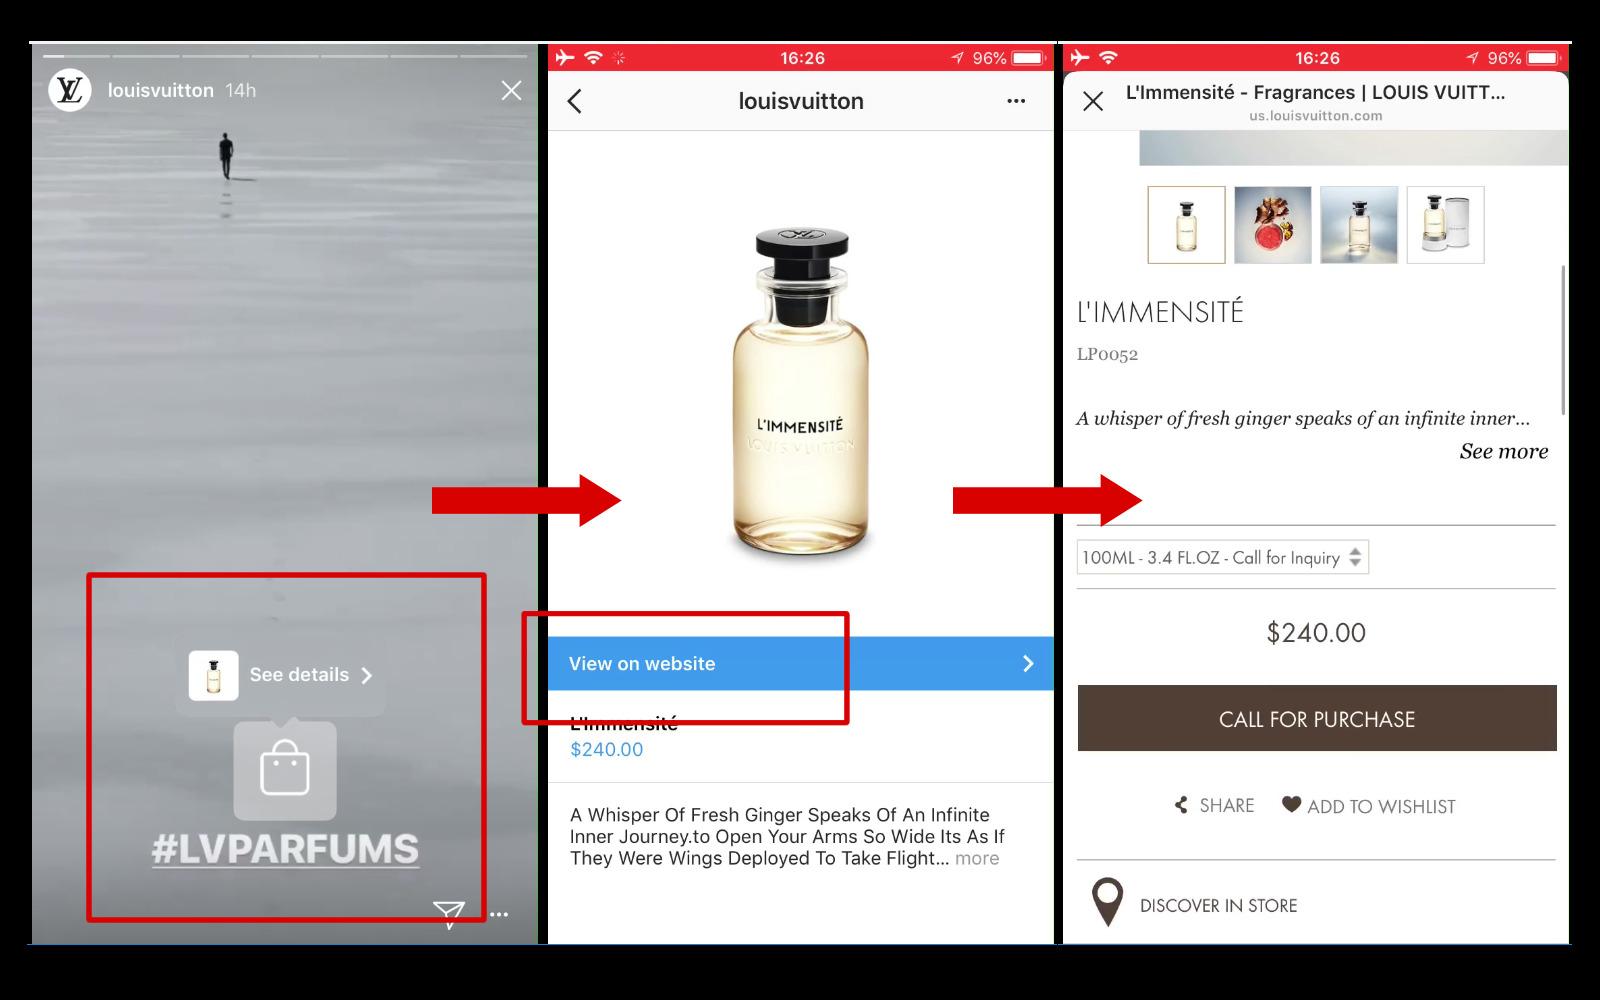 Instagramショッピング新機能!「ストーリーズにショッピングタグ投稿、直接販売」可能に!ルイ・ヴィトンAritziaに実装!Instagram最新情報、ニュース速報2018